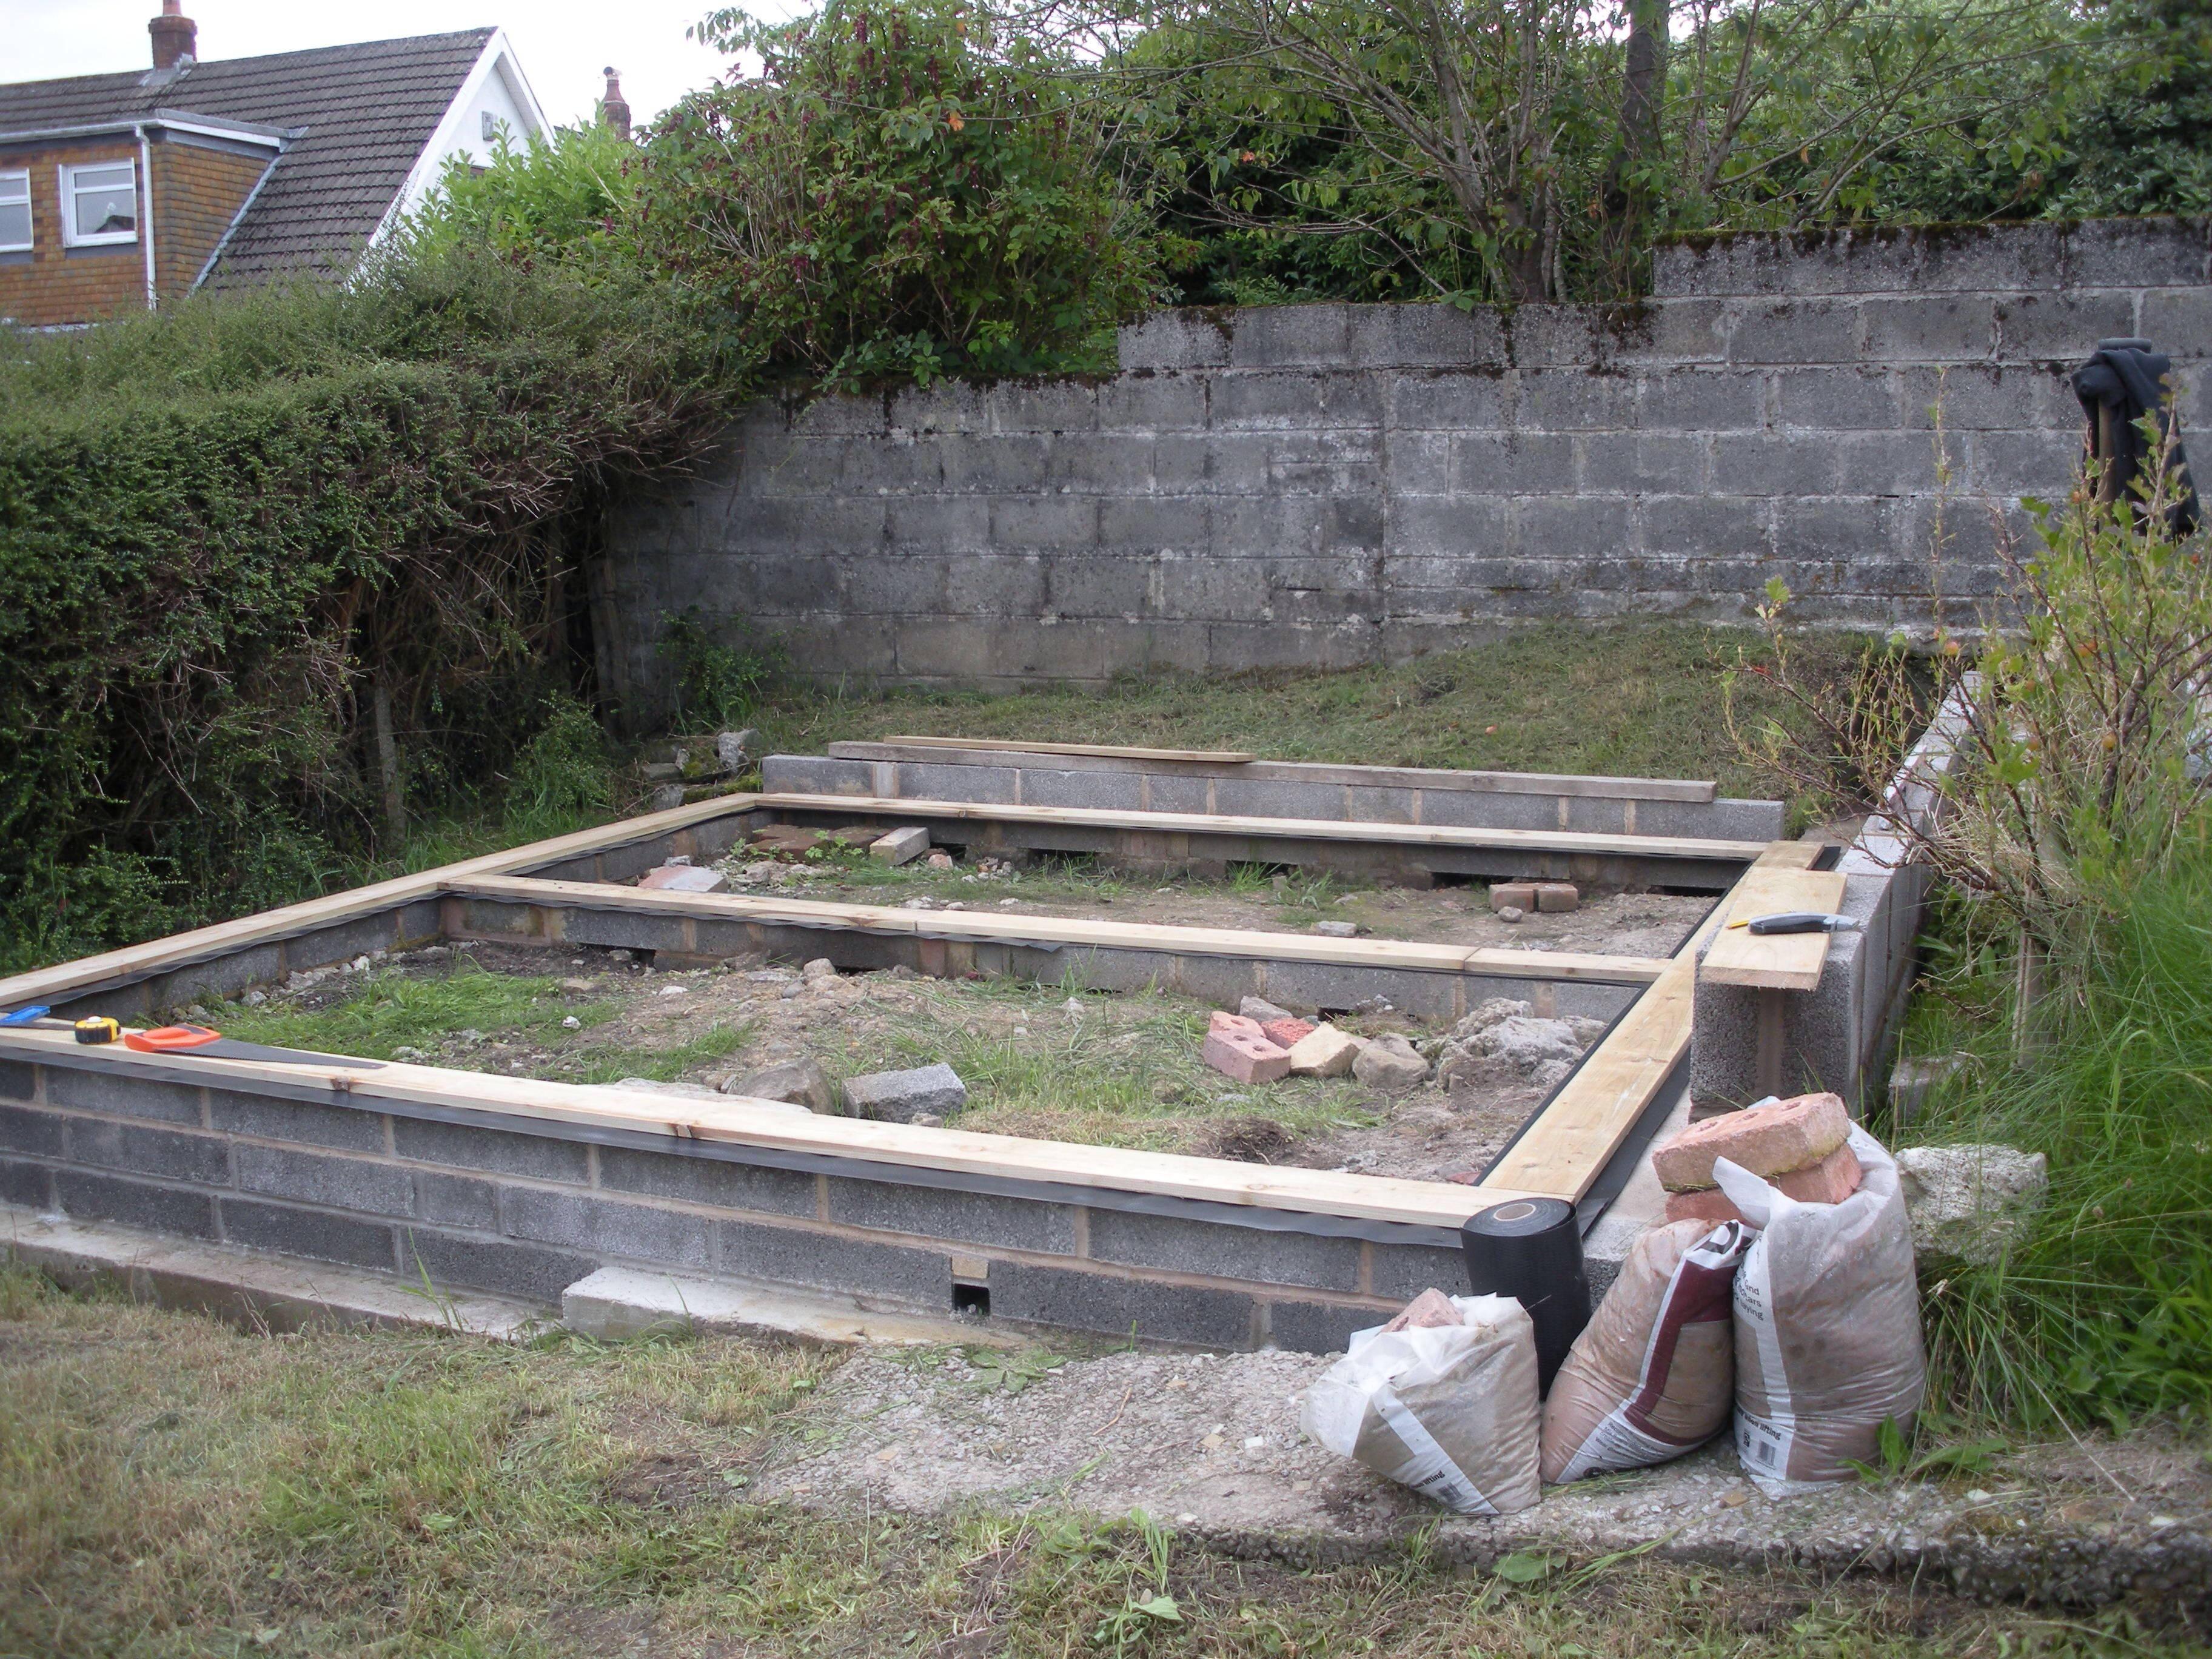 12x12 shed base - uneven ground   Shed plans, Backyard ... on Unlevel Backyard Ideas id=69024